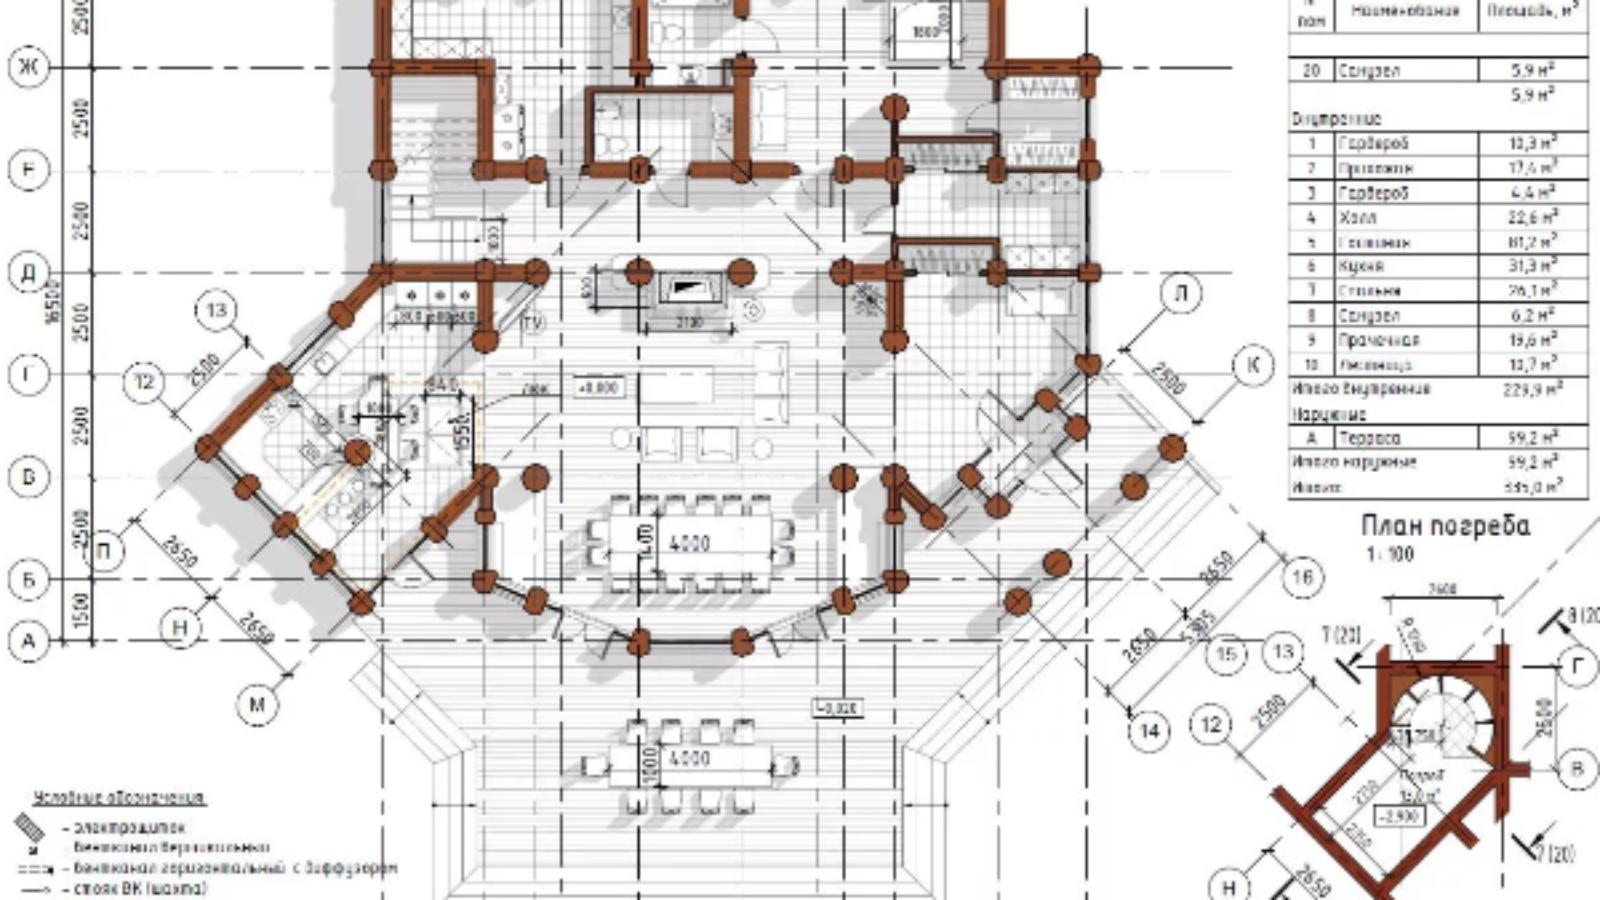 технический план многоквартирного дома